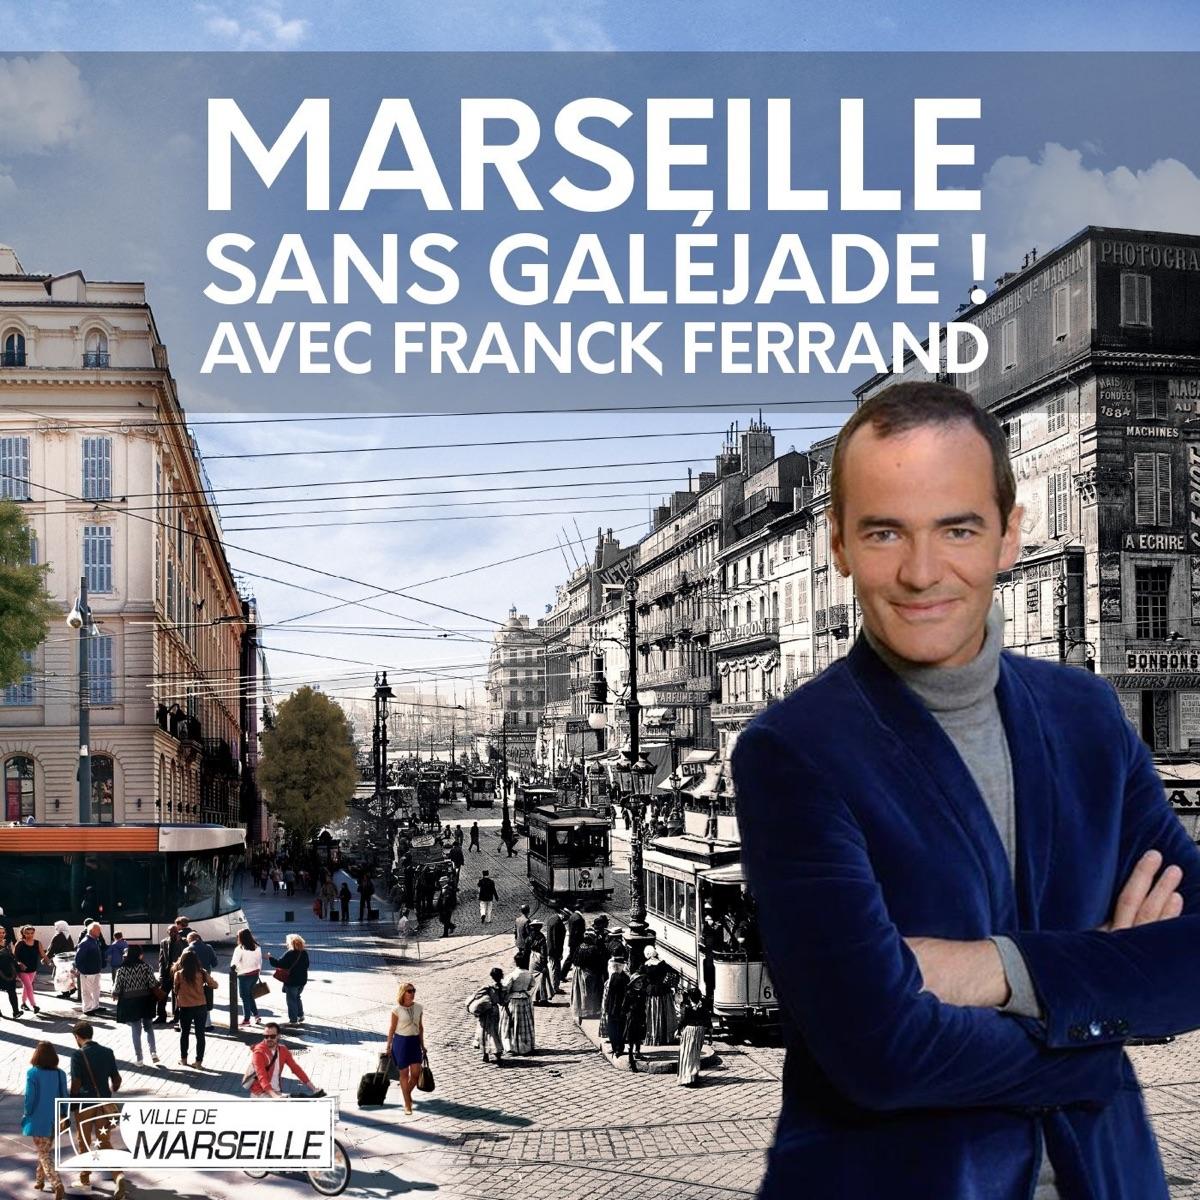 Marseille sans galéjade ! - avec Franck Ferrand